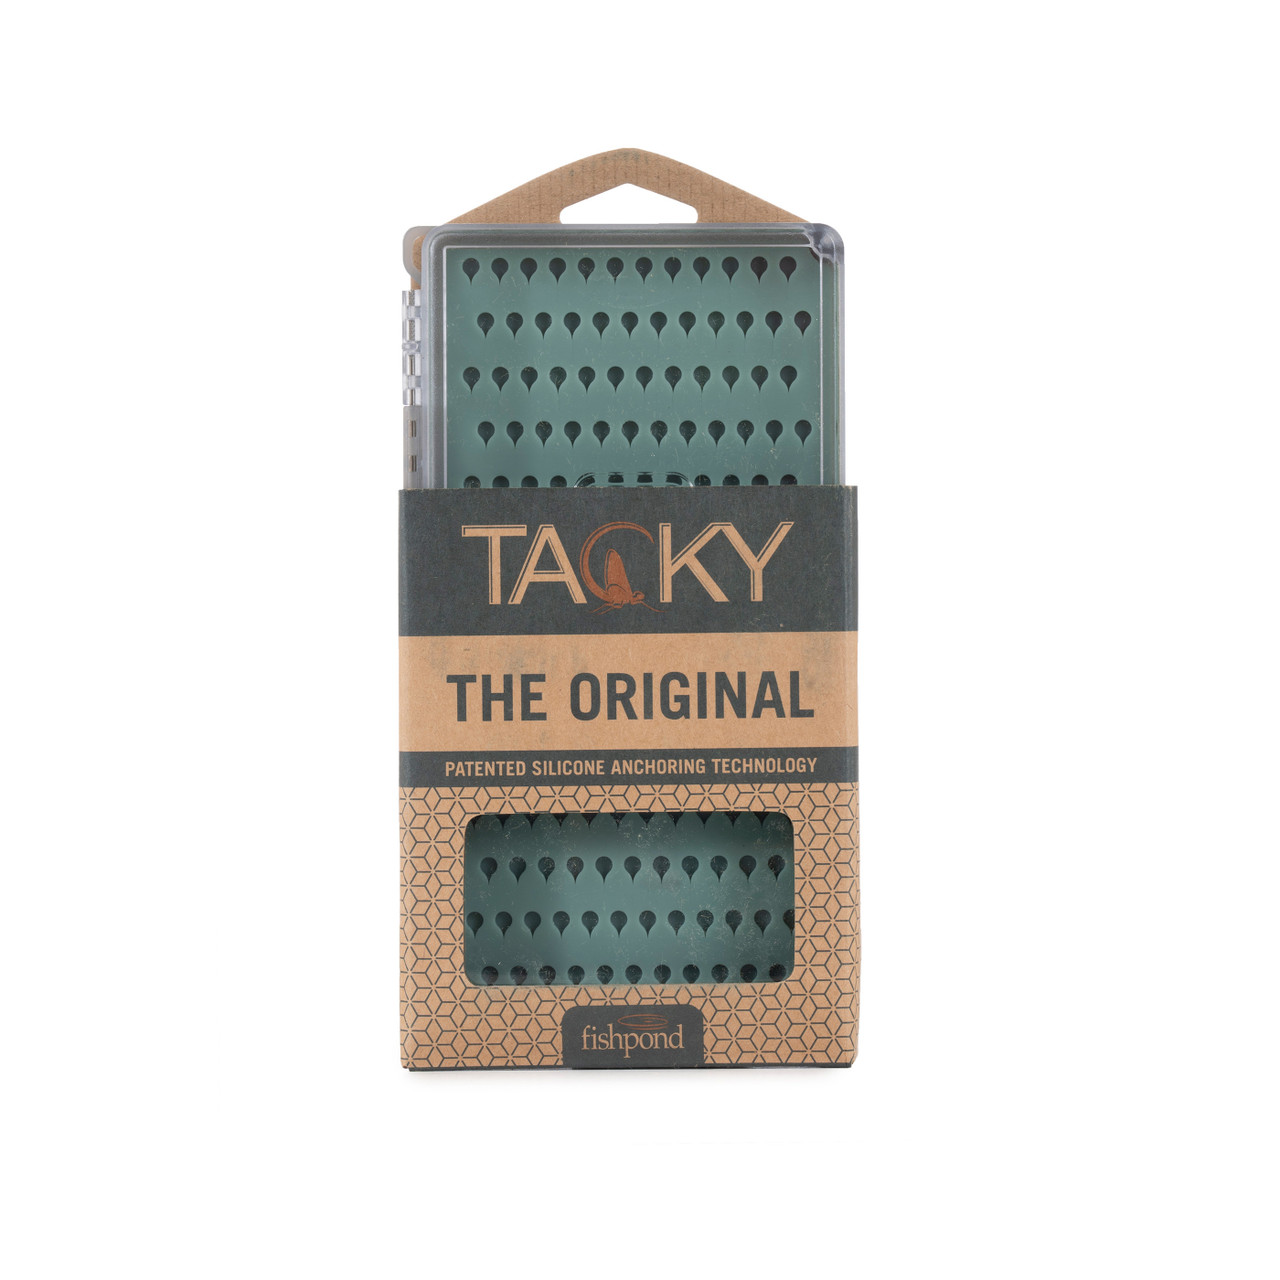 Fishpond Tacky Original Fly Box, 1 Sided